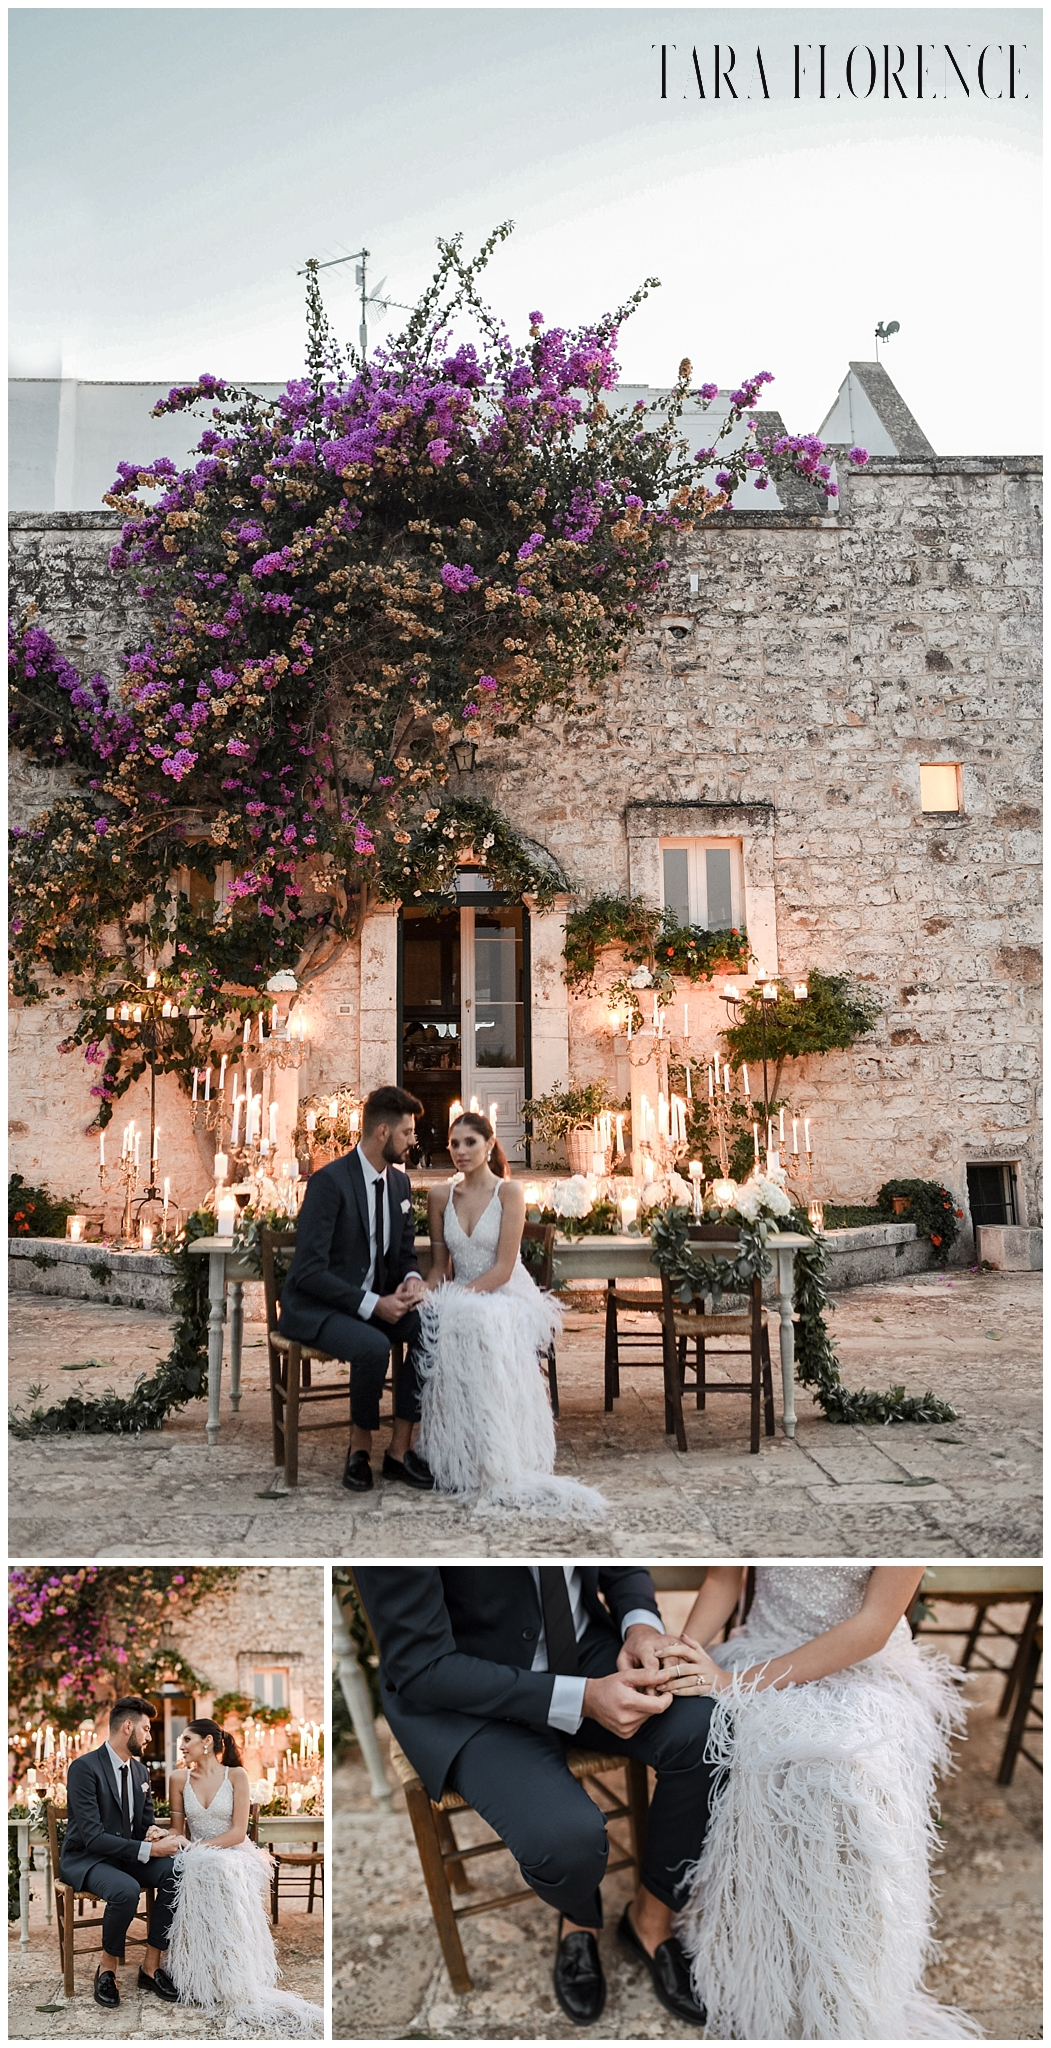 Puglia-Tara-Florence-Bridal-Editorial-179_WEB.jpg